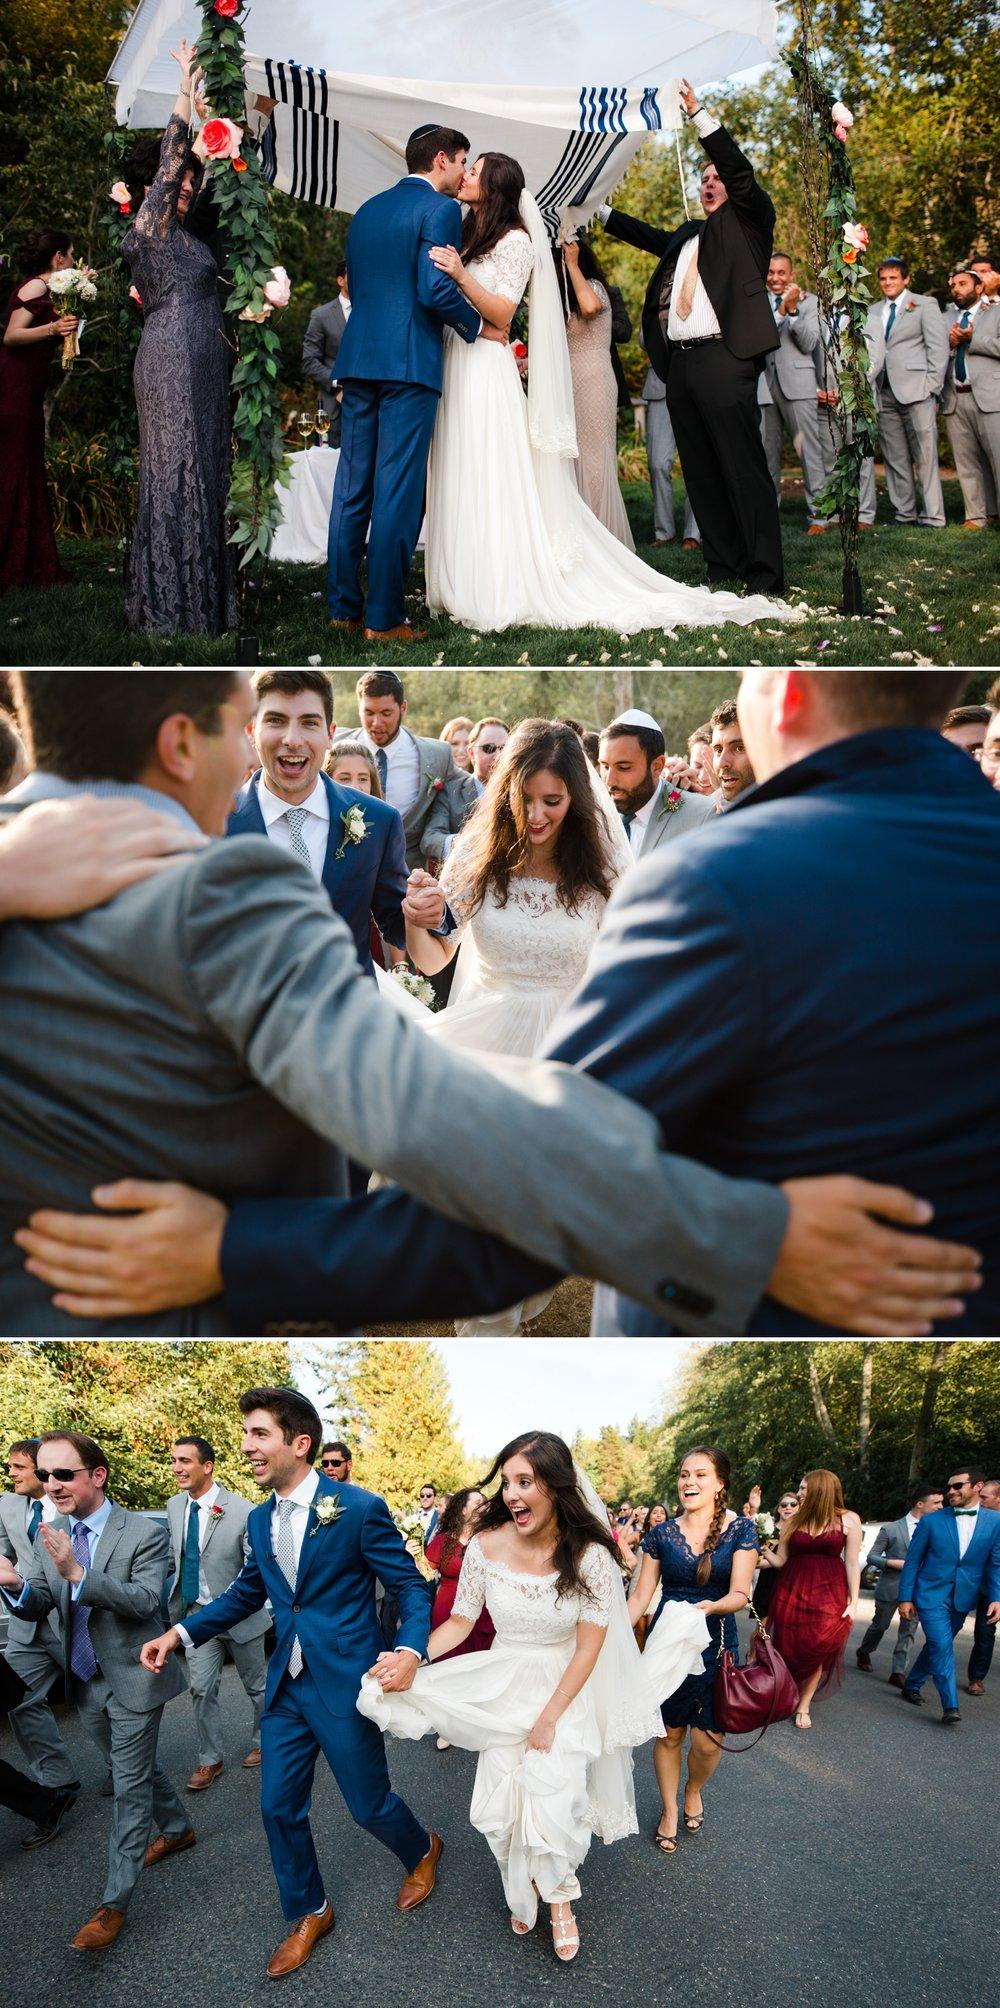 14-normandy-park-cove-fun-jewish-wedding.jpg